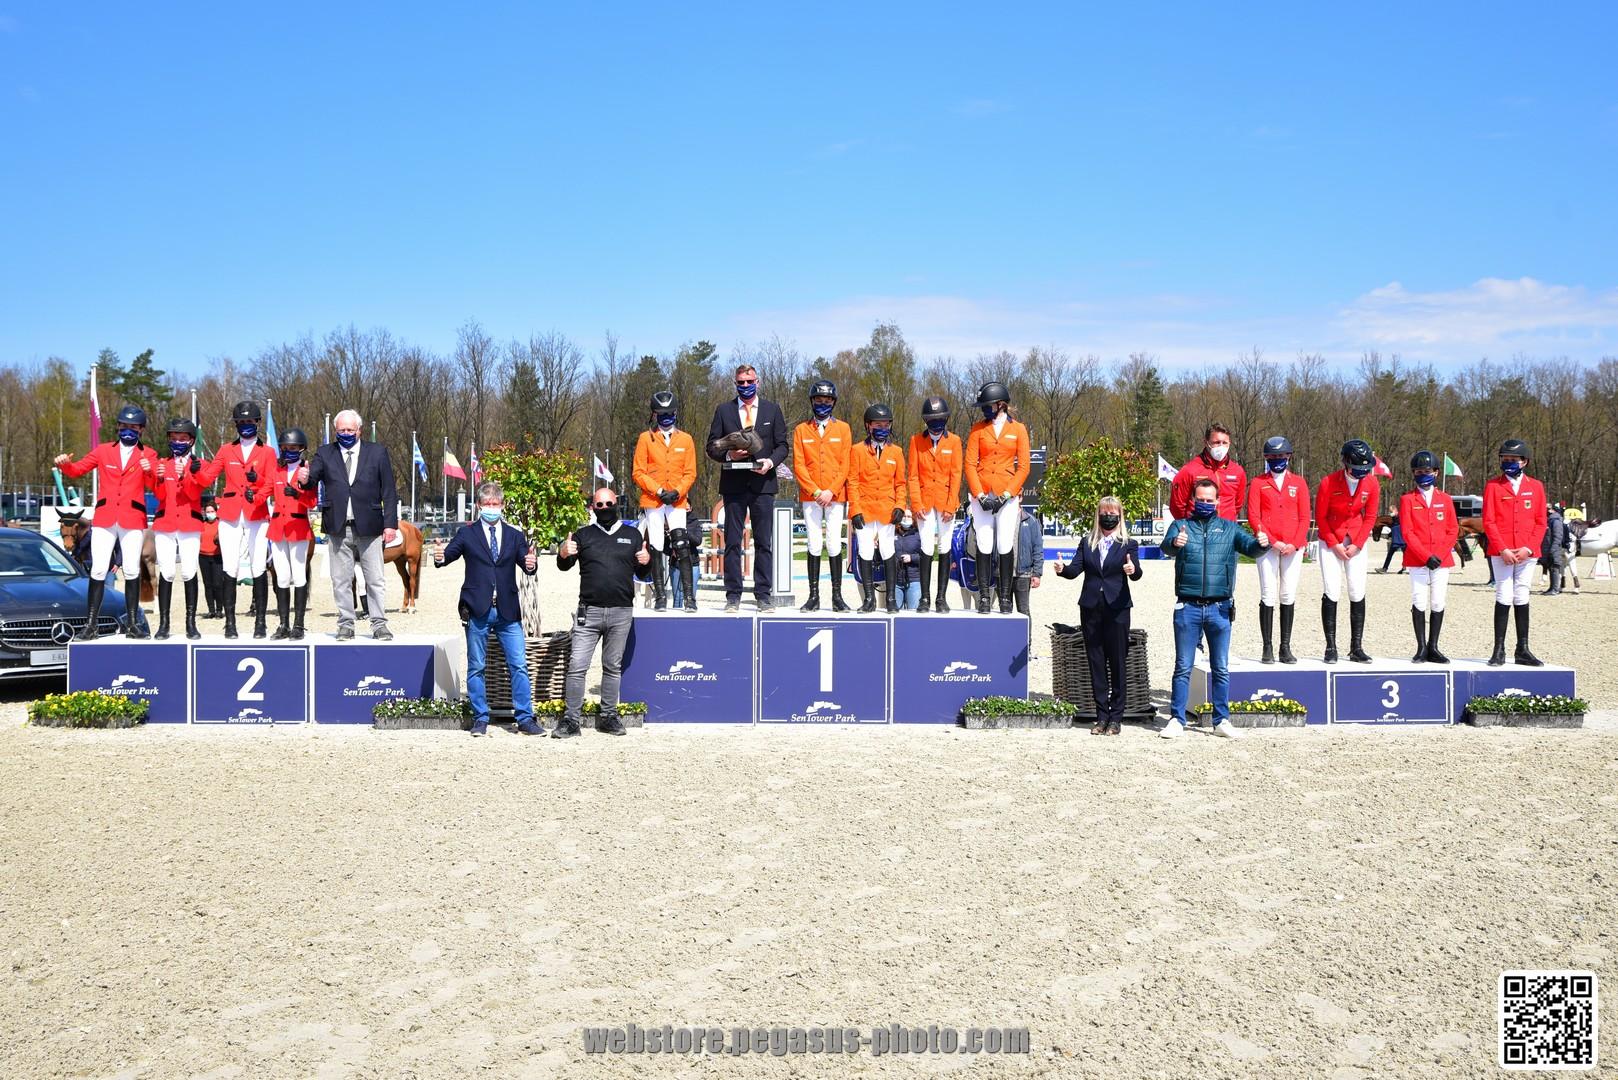 Nederlandse ponyruiters winnen Nations Cup Sentower Park